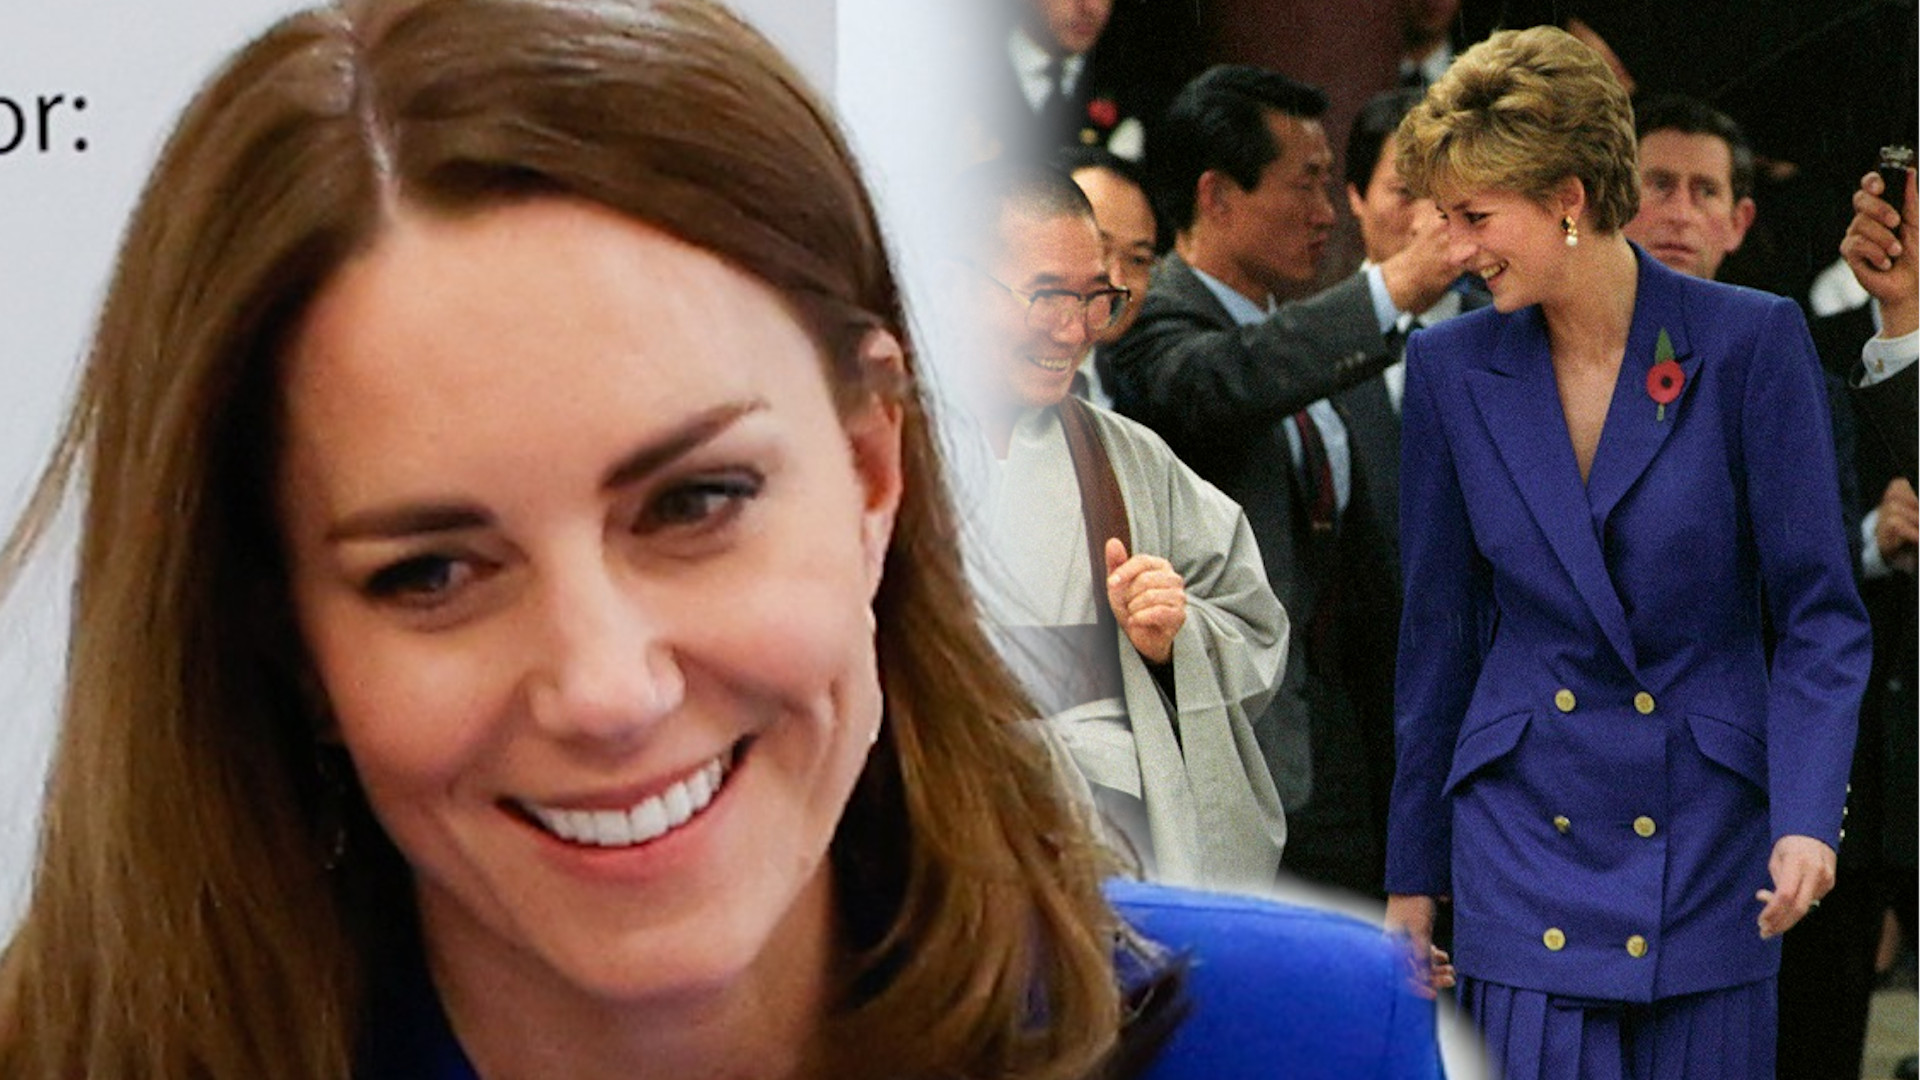 Księżna Kate jak księżna Diana. To niemal replika